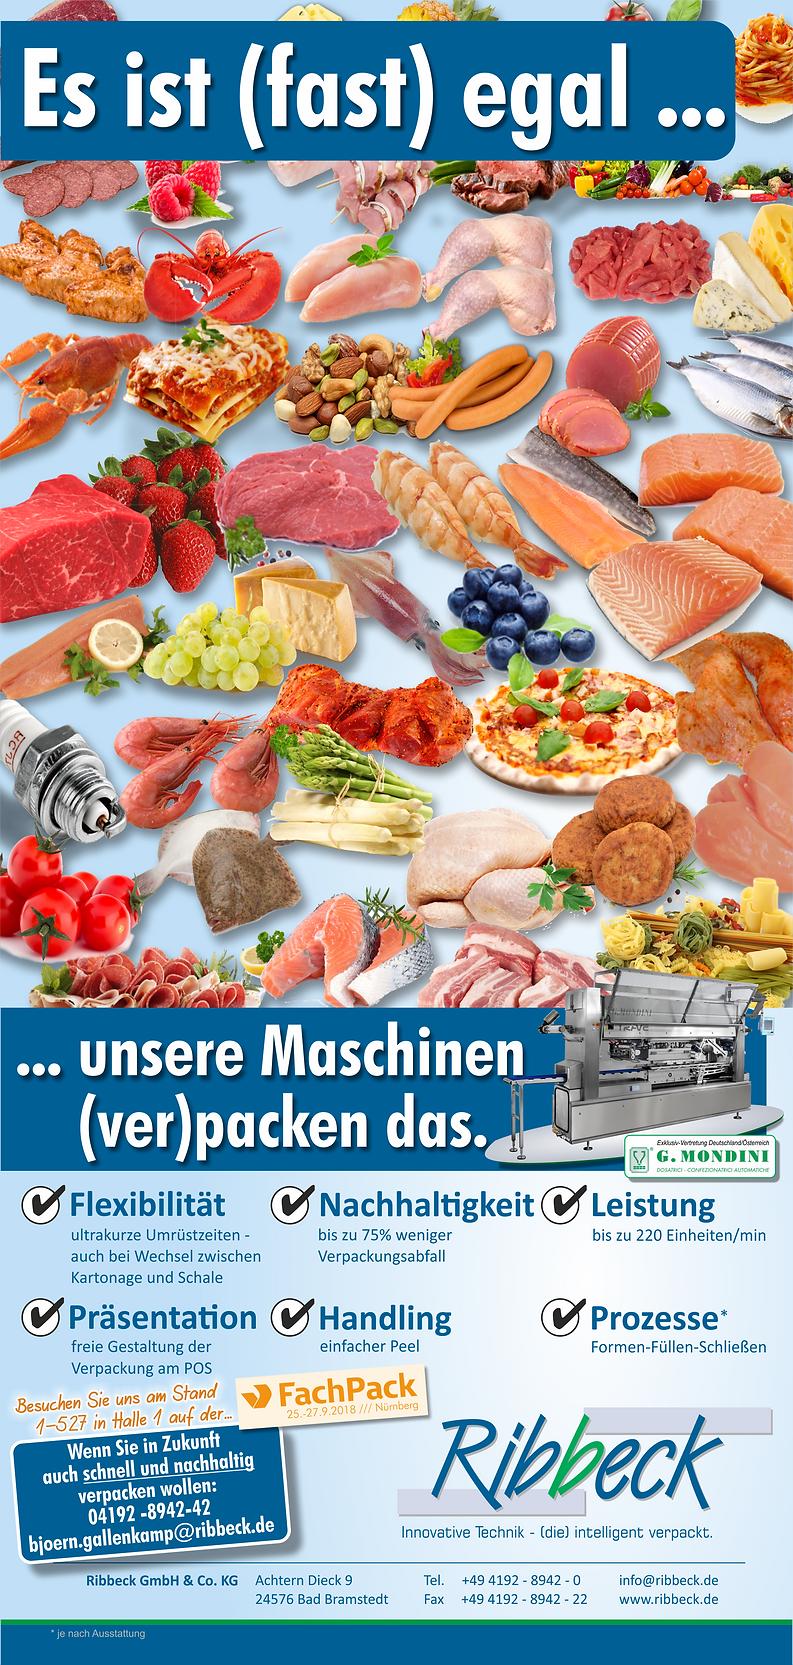 180828-807087-Ribbeck-Lebensmittelzeitun